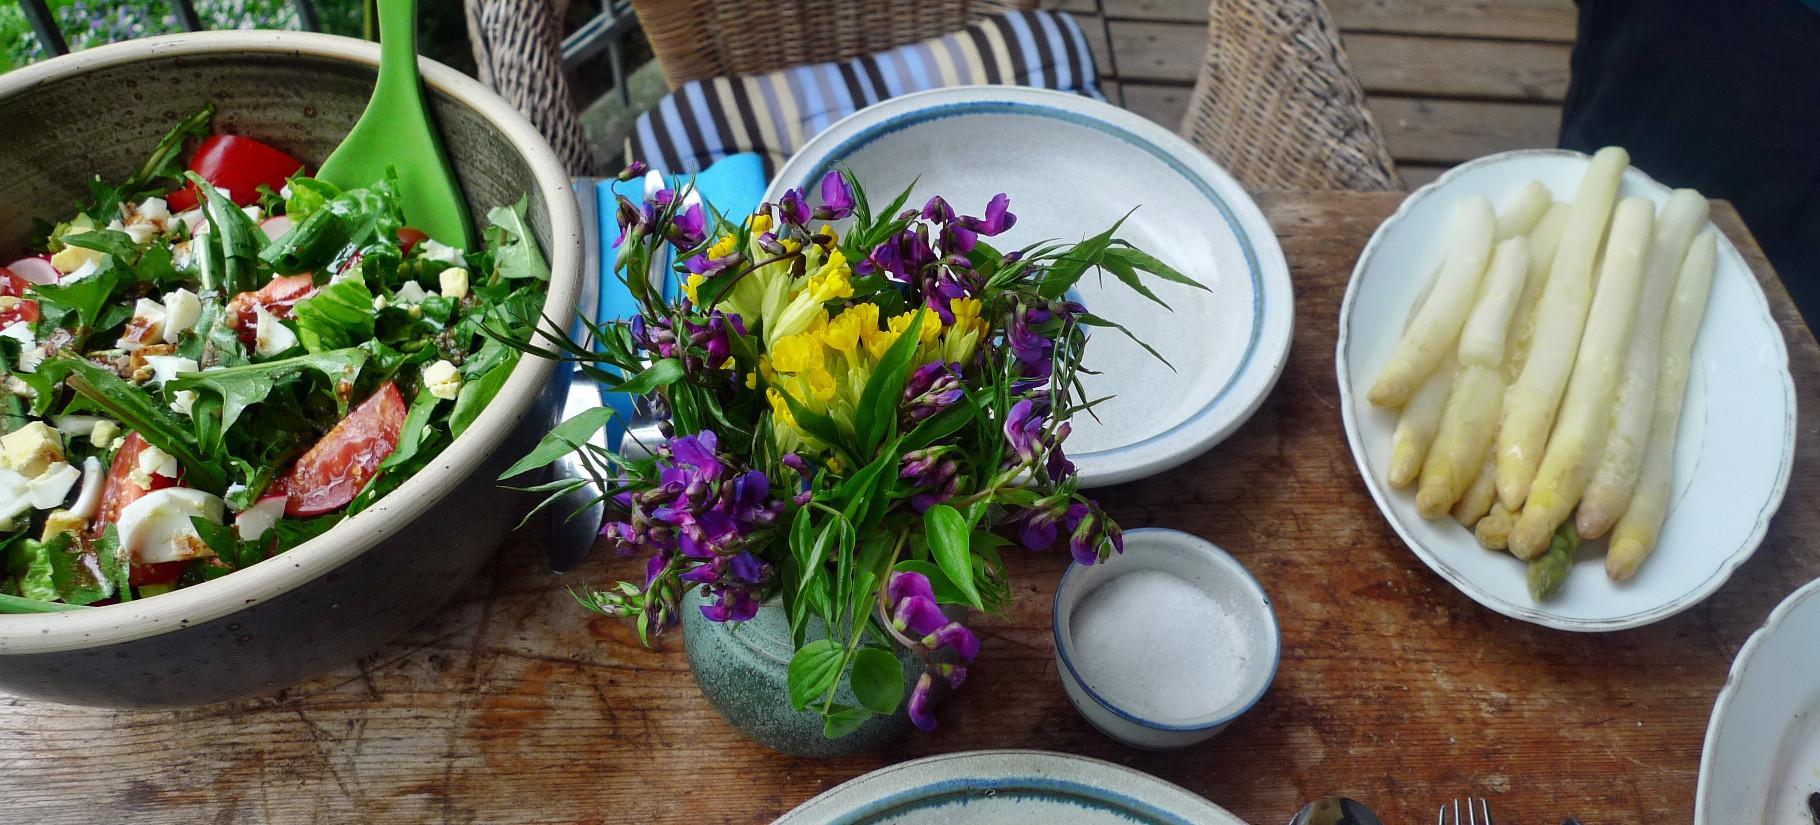 Lachs,Spargel,Salat,Kartoffeln - 25.4.15   (9)